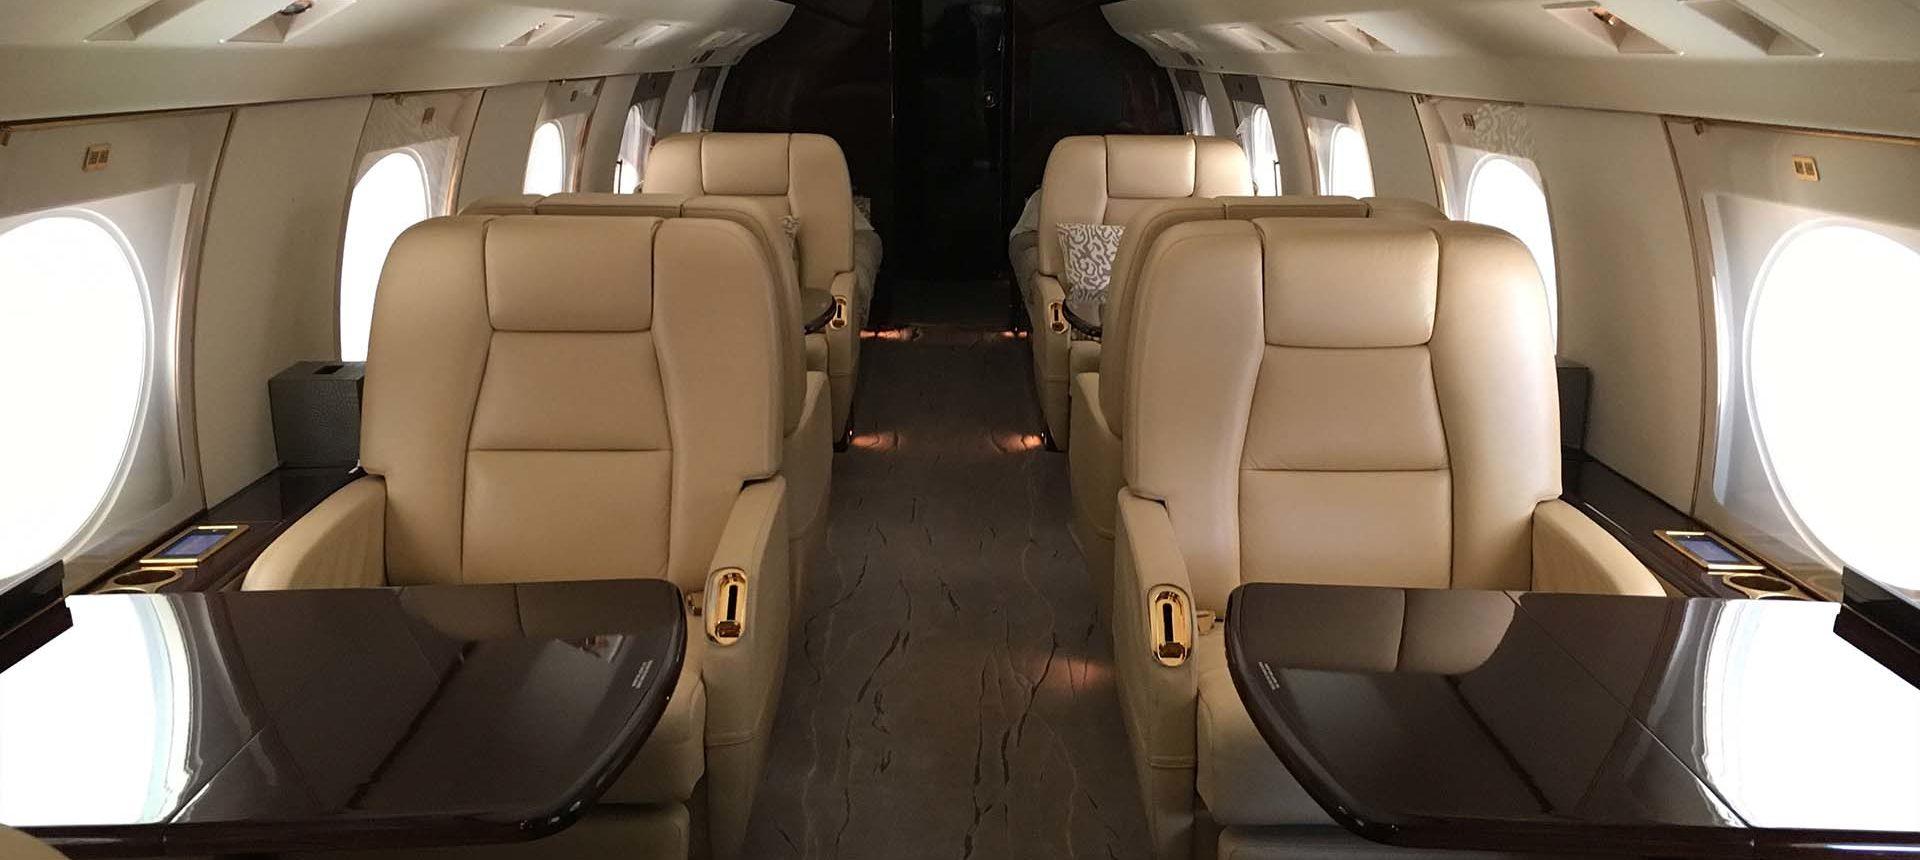 G450-1 Forward cabin looking aft